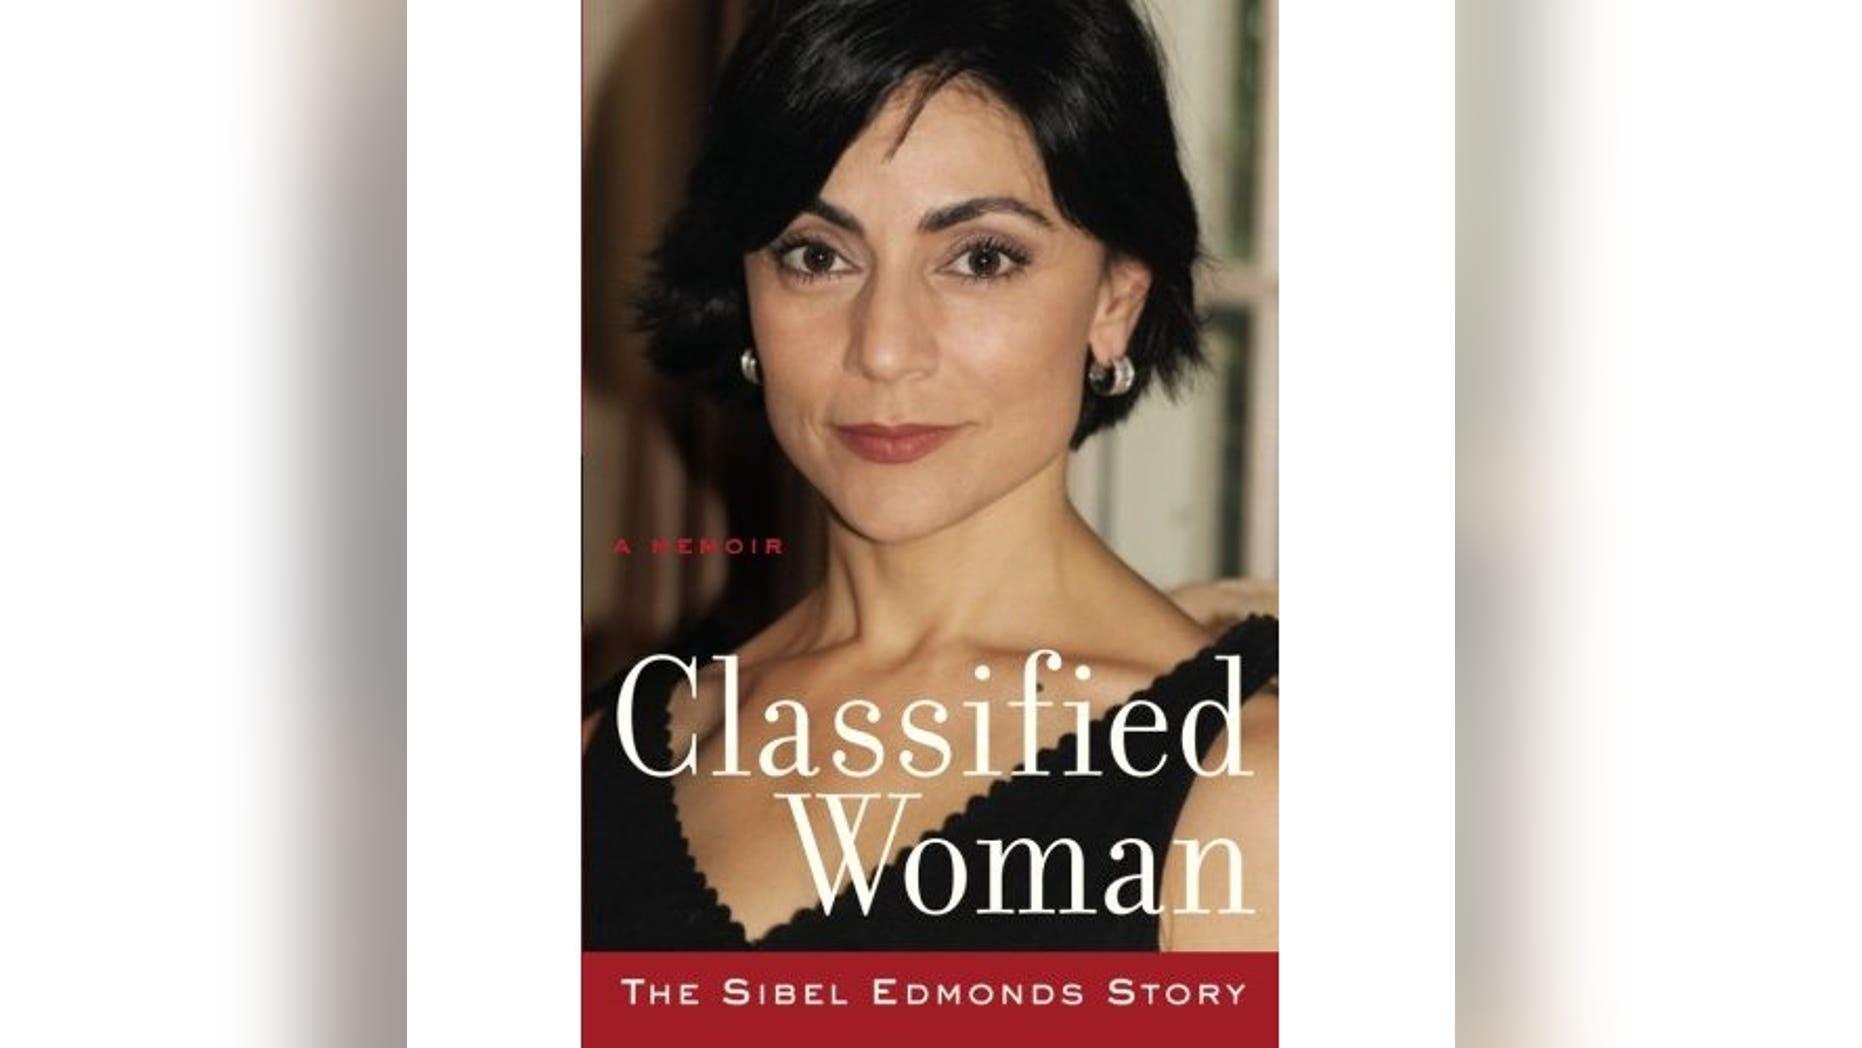 """Classified Woman - The Sibel Edmonds Story: A Memoir"" as seen on Amazon.com"